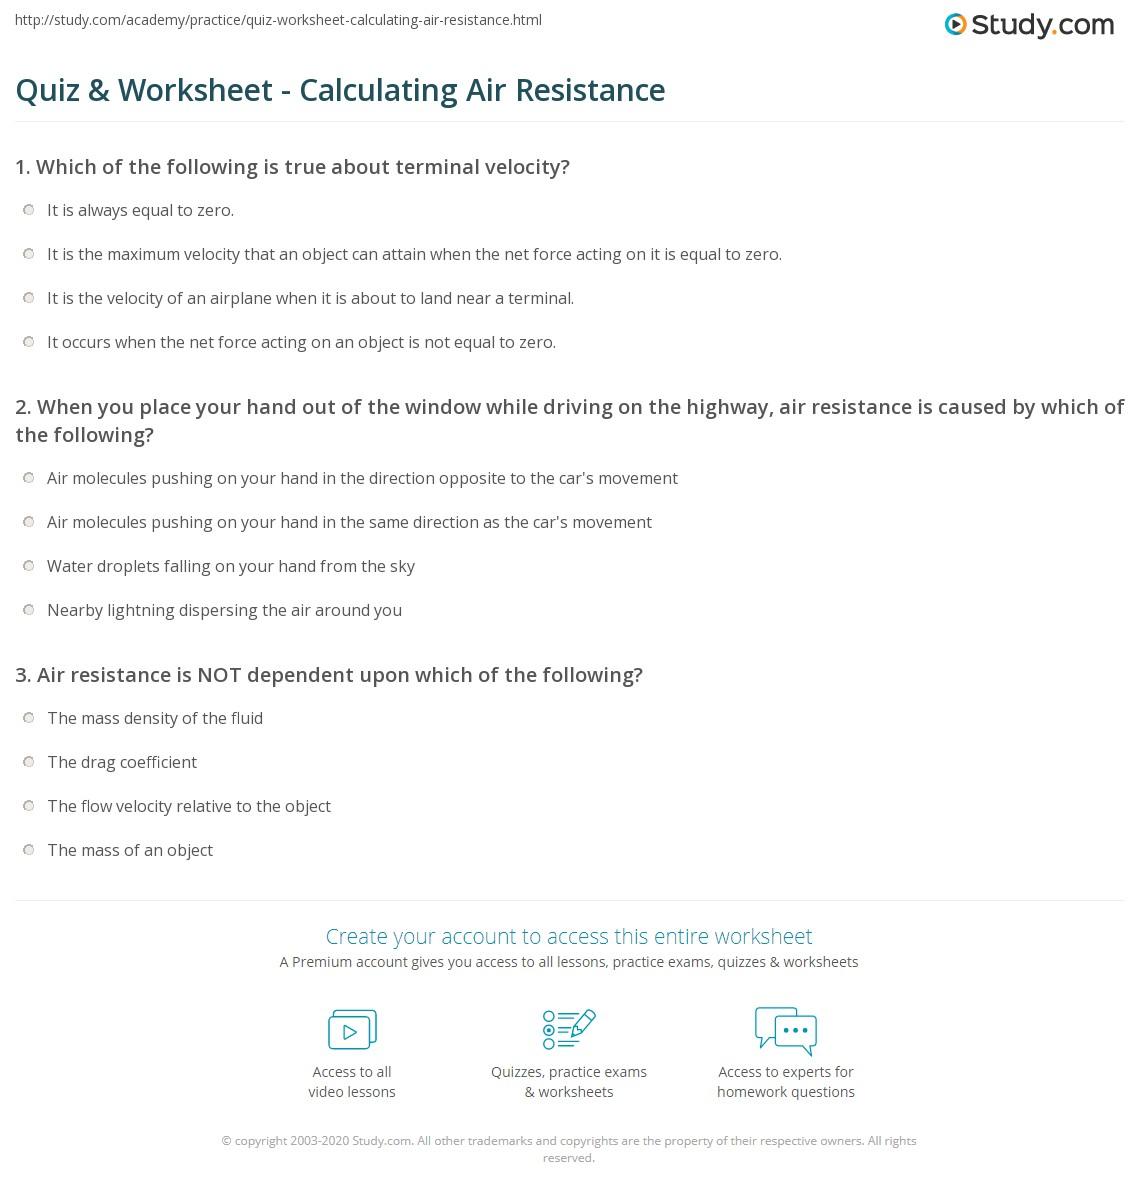 Quiz & Worksheet - Calculating Air Resistance   Study.com